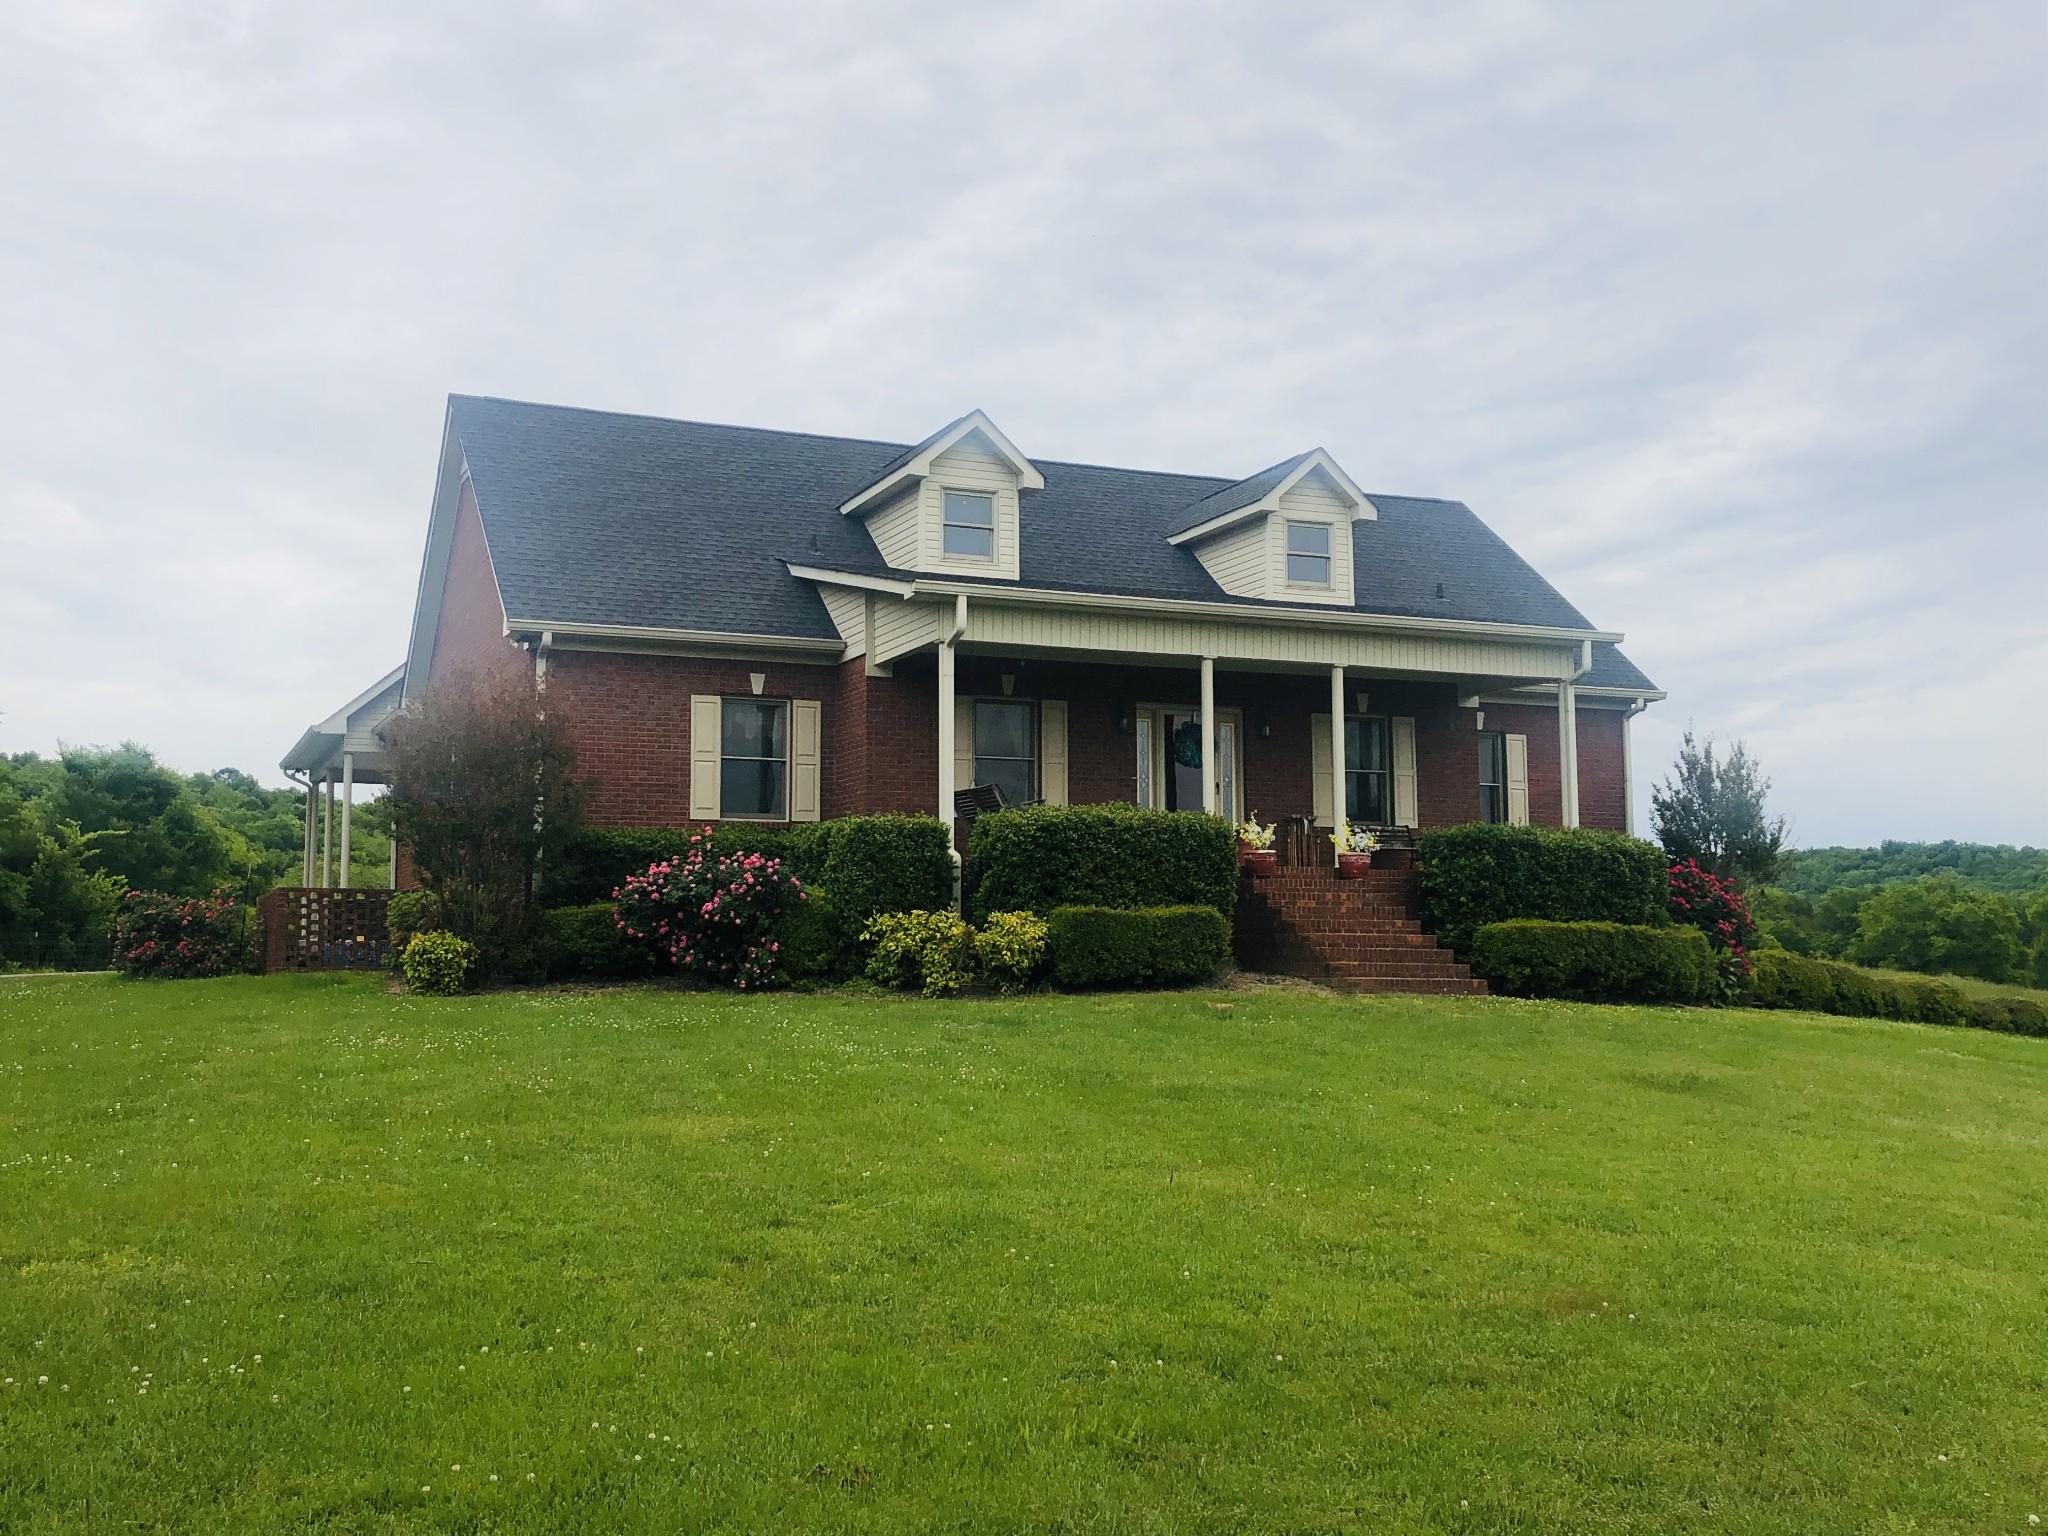 247 Poorhouse Rd, Taft, TN 38488 - Taft, TN real estate listing